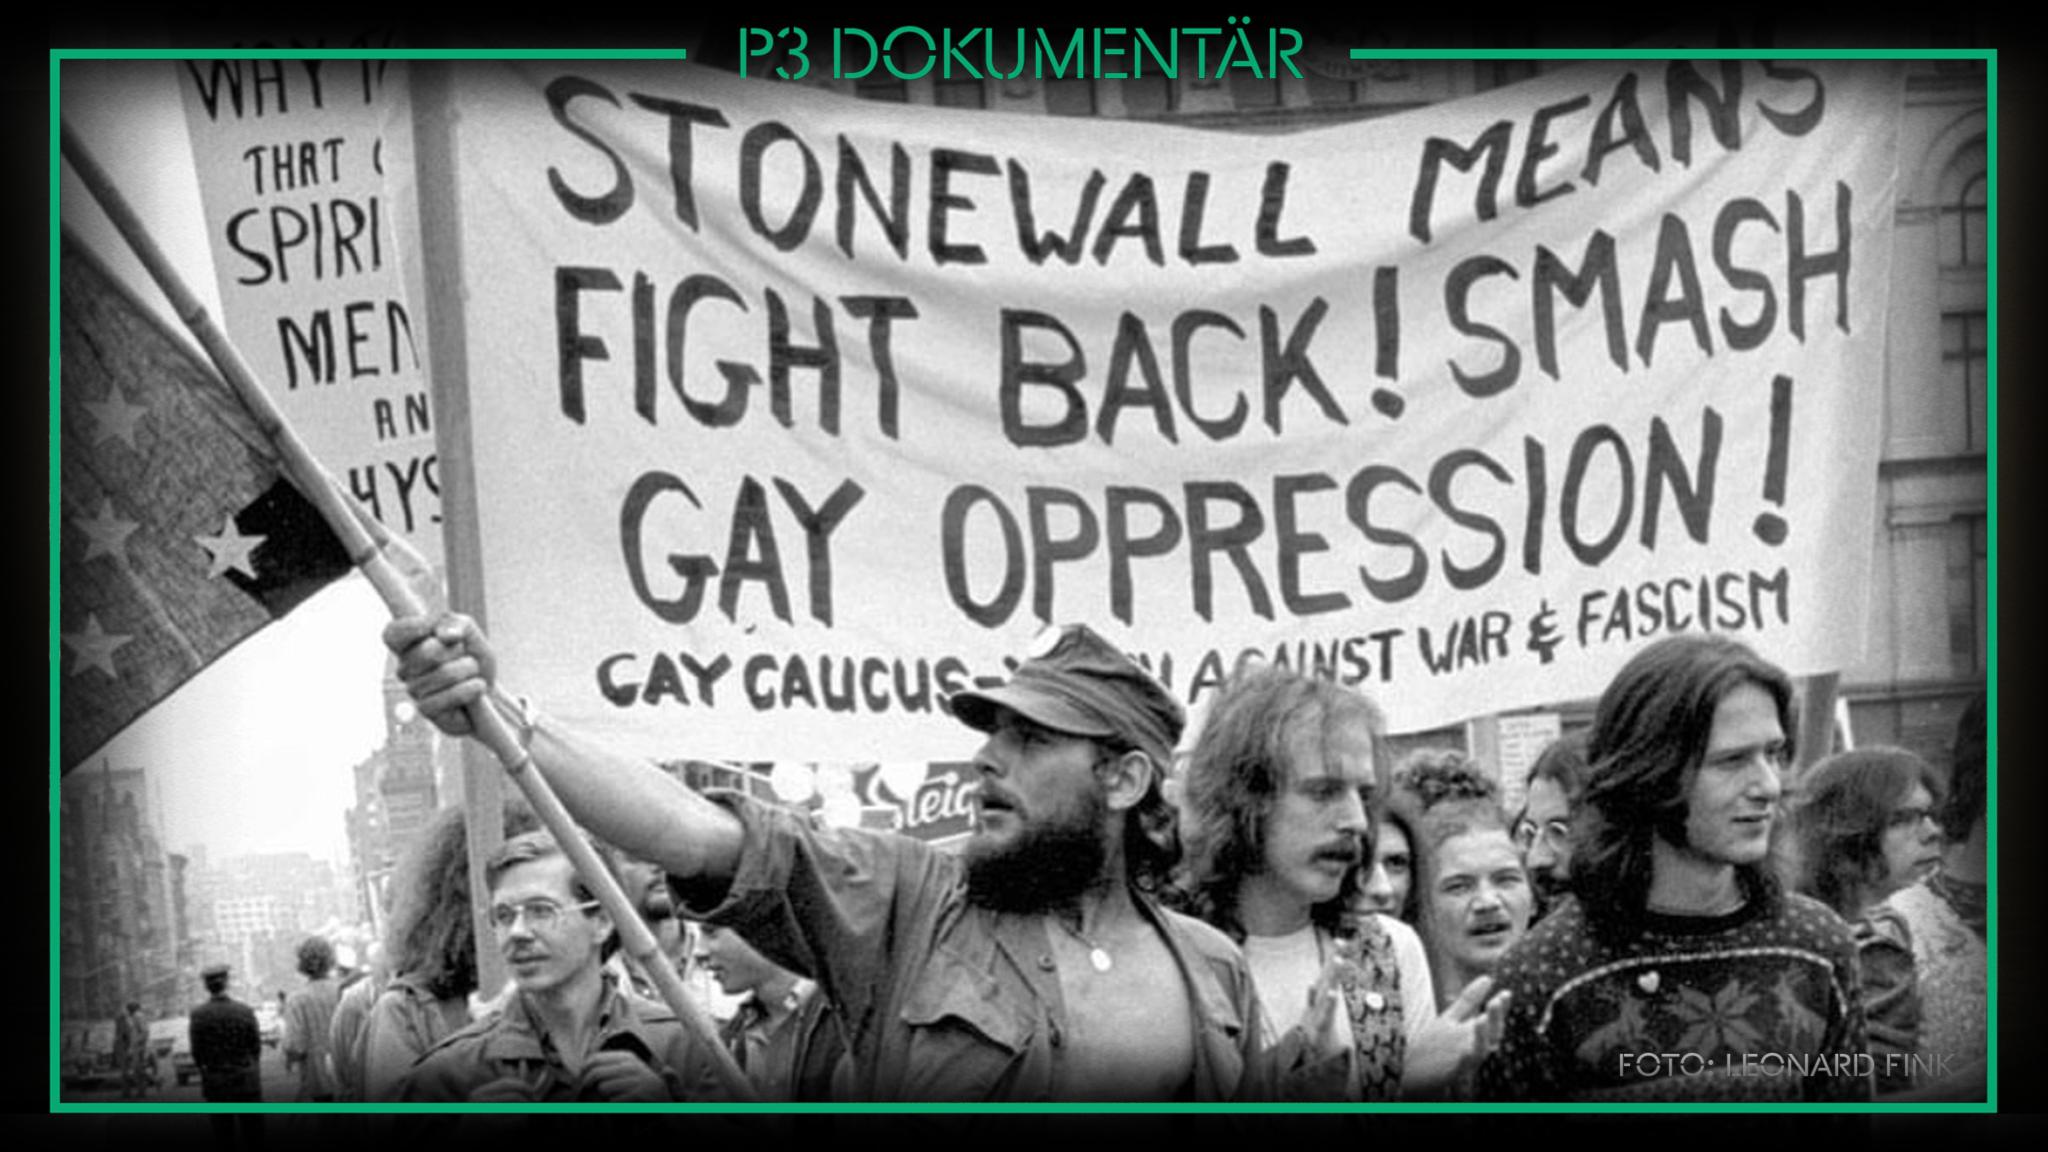 Stonewall-upproret